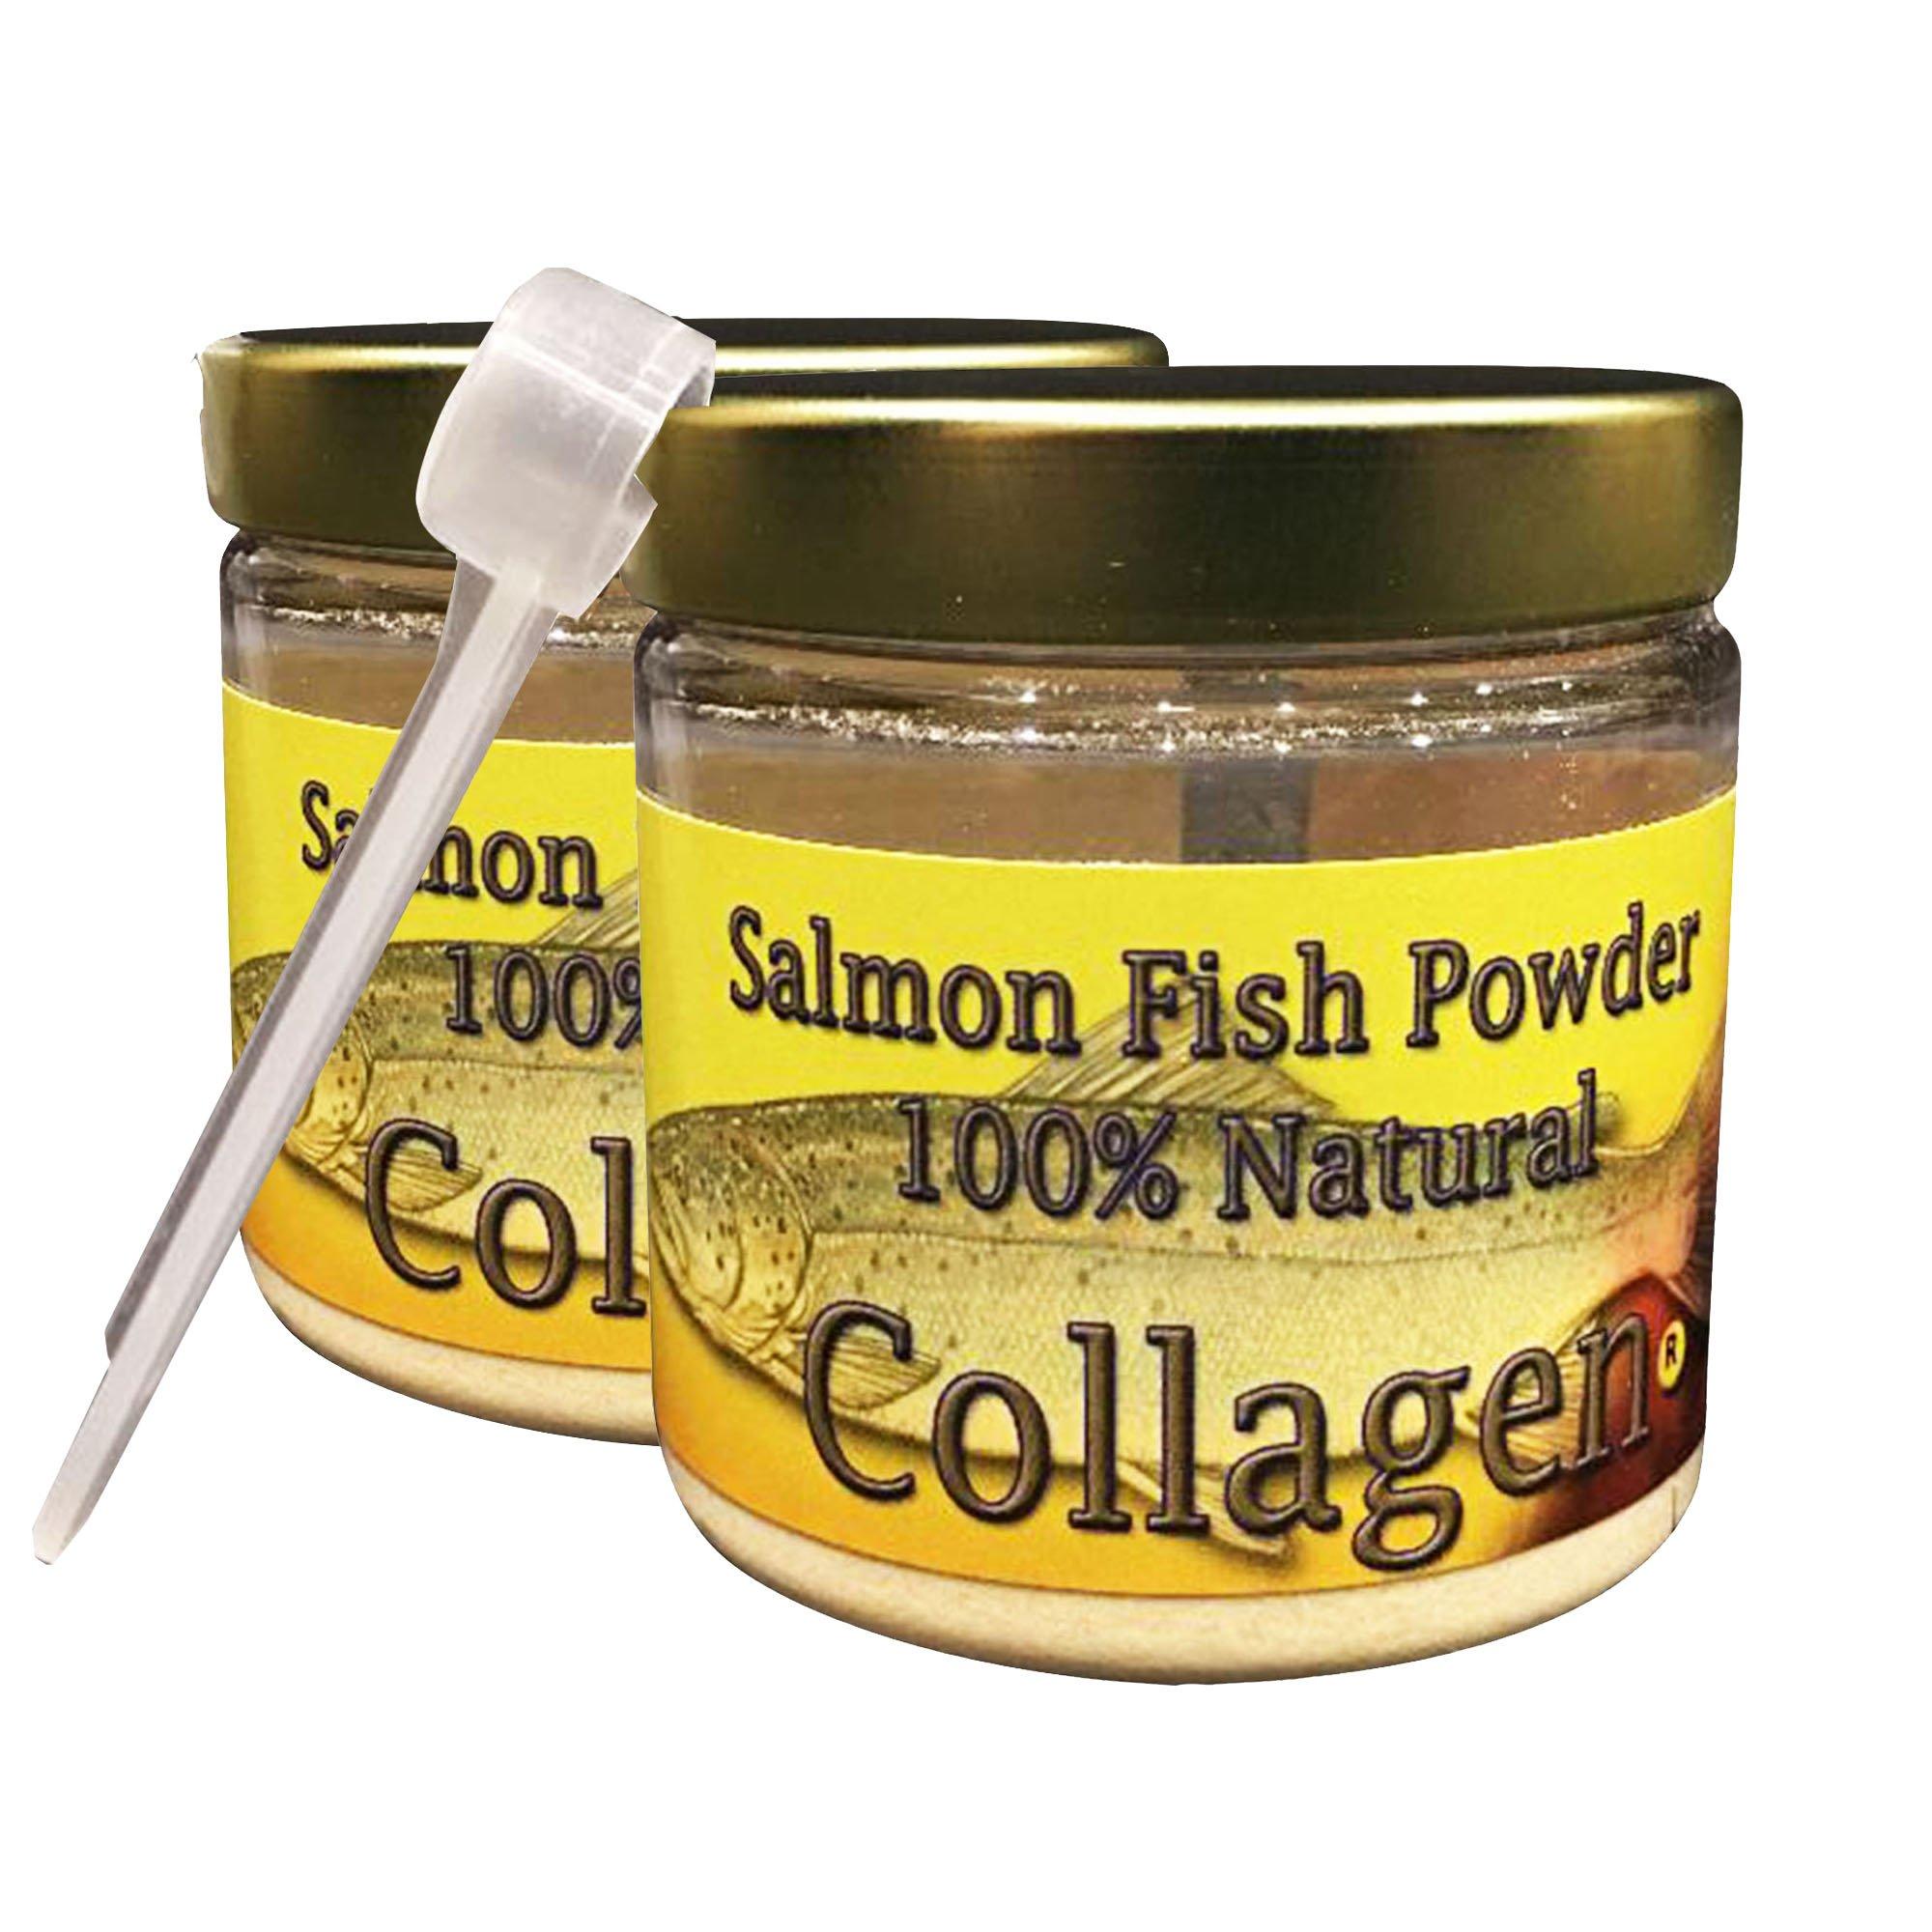 SALCOLL COLLAGEN Natural Salmon Fish Supplement Powder for Joint Pain Relief, Rheumatoid Arthritis & Osteoporosis - Cartilage & Bone Regeneration - 1.23 Oz Each - 2 Pack